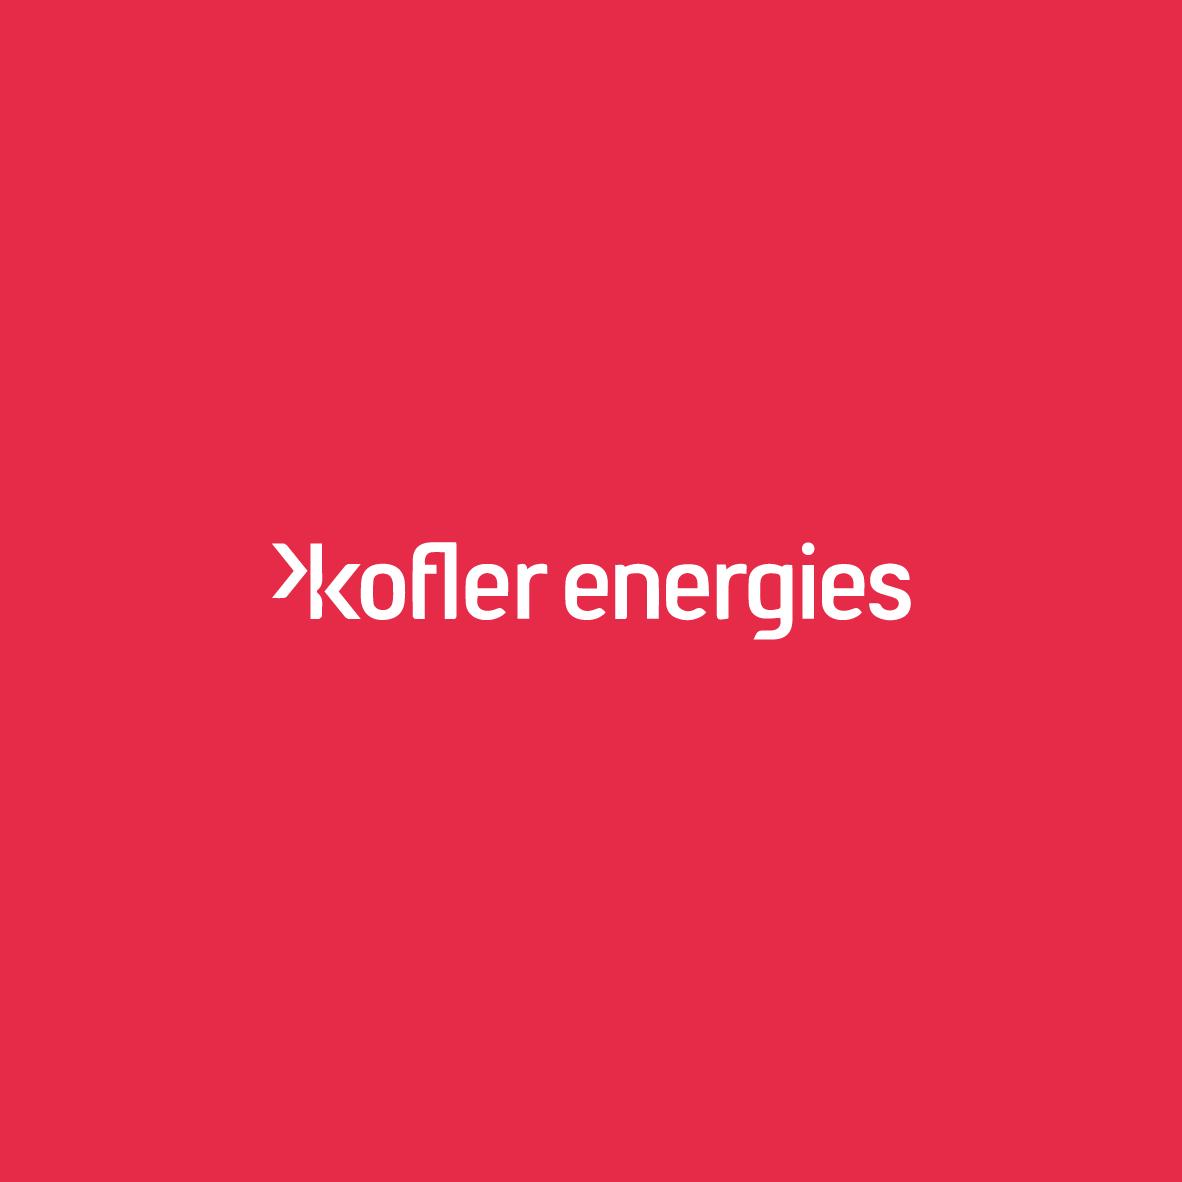 19_KOFLER ENERGIES.png